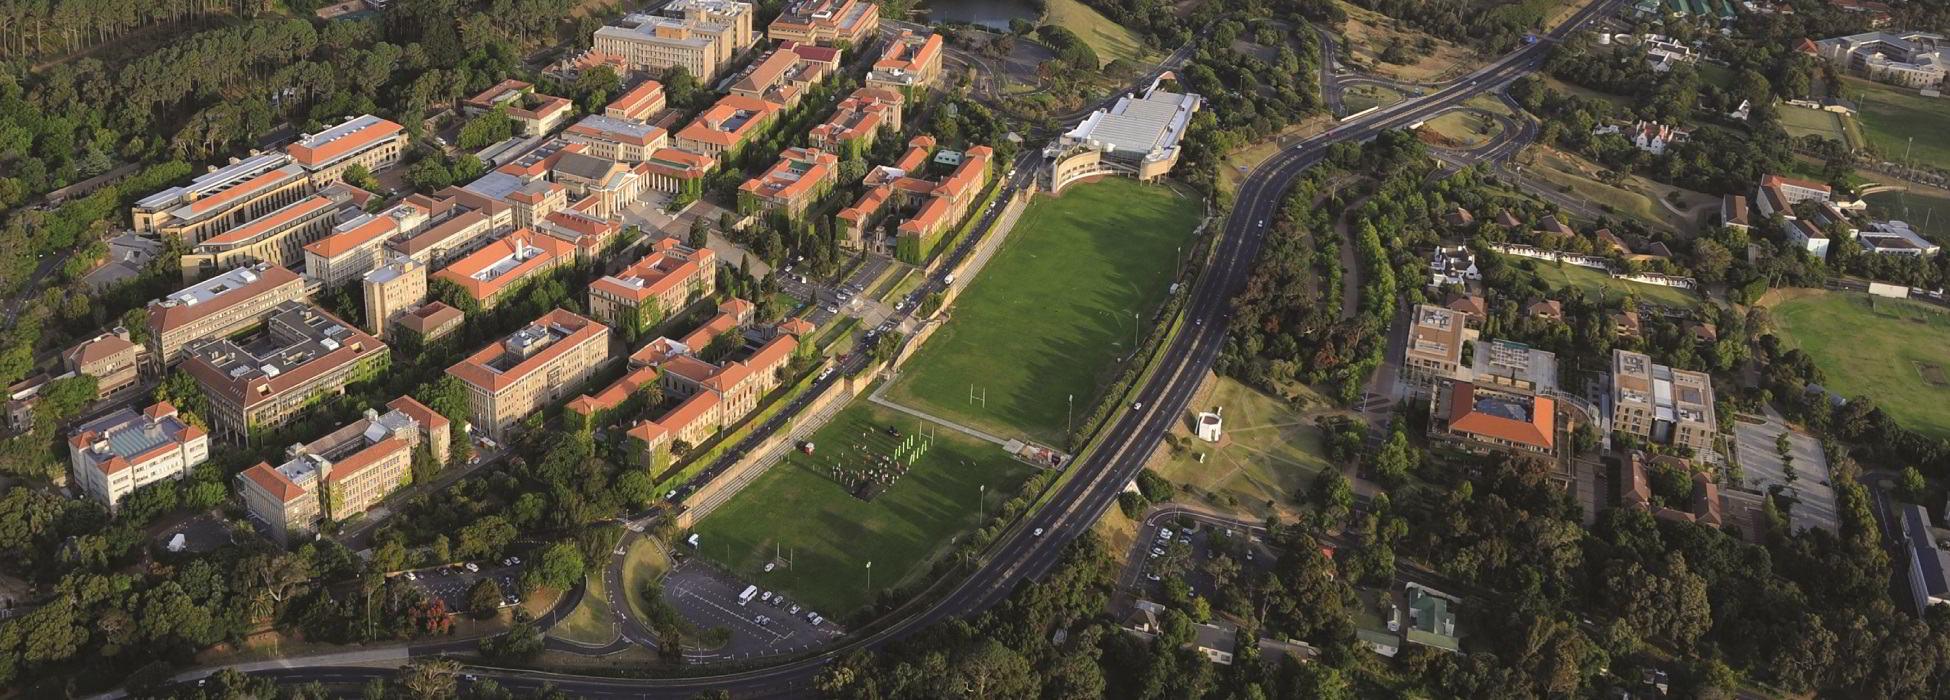 University Of Cape Town World University Rankings The